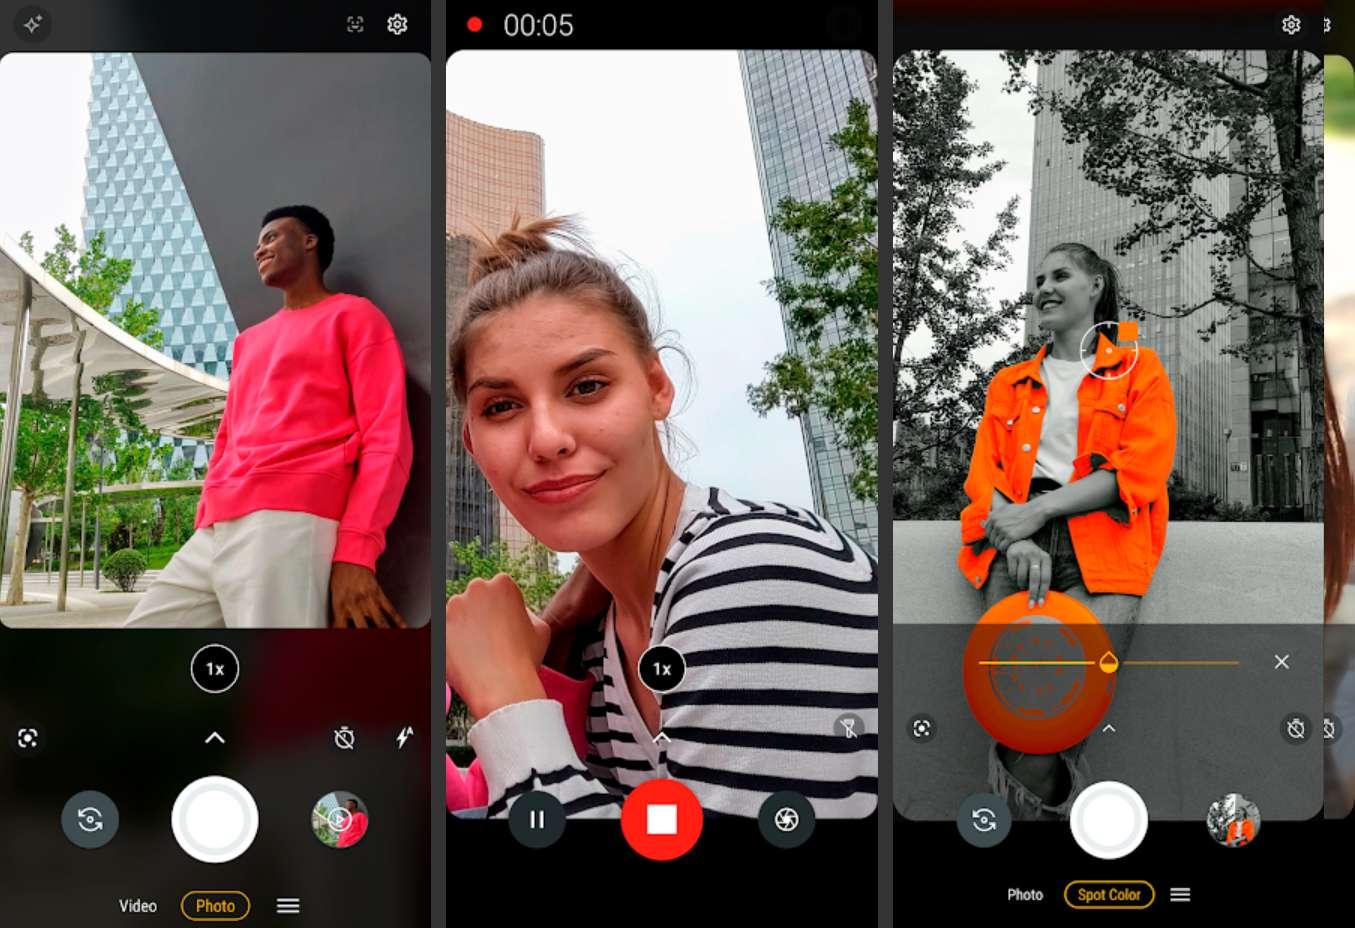 Moto Camera app showing various options